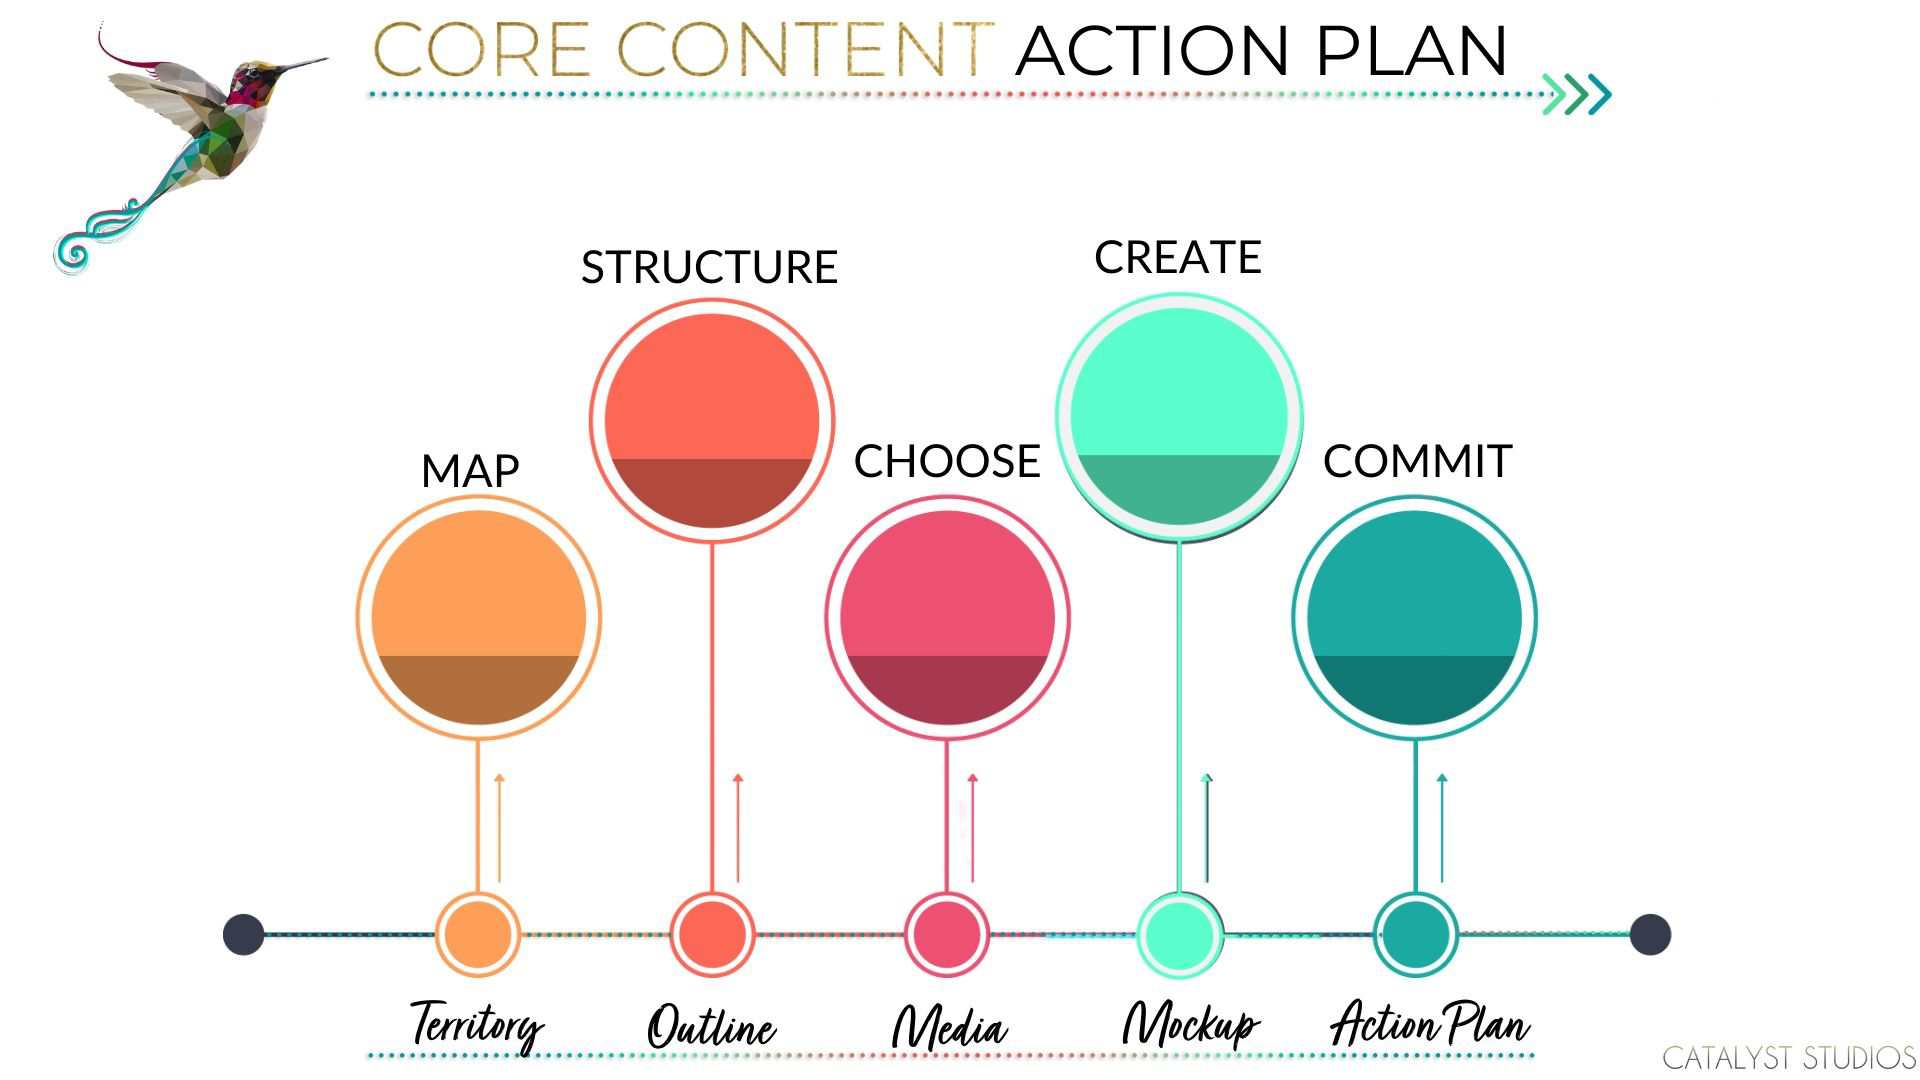 Core Content Action Plan- course overview (Growth Lab & Catalyst Studios)